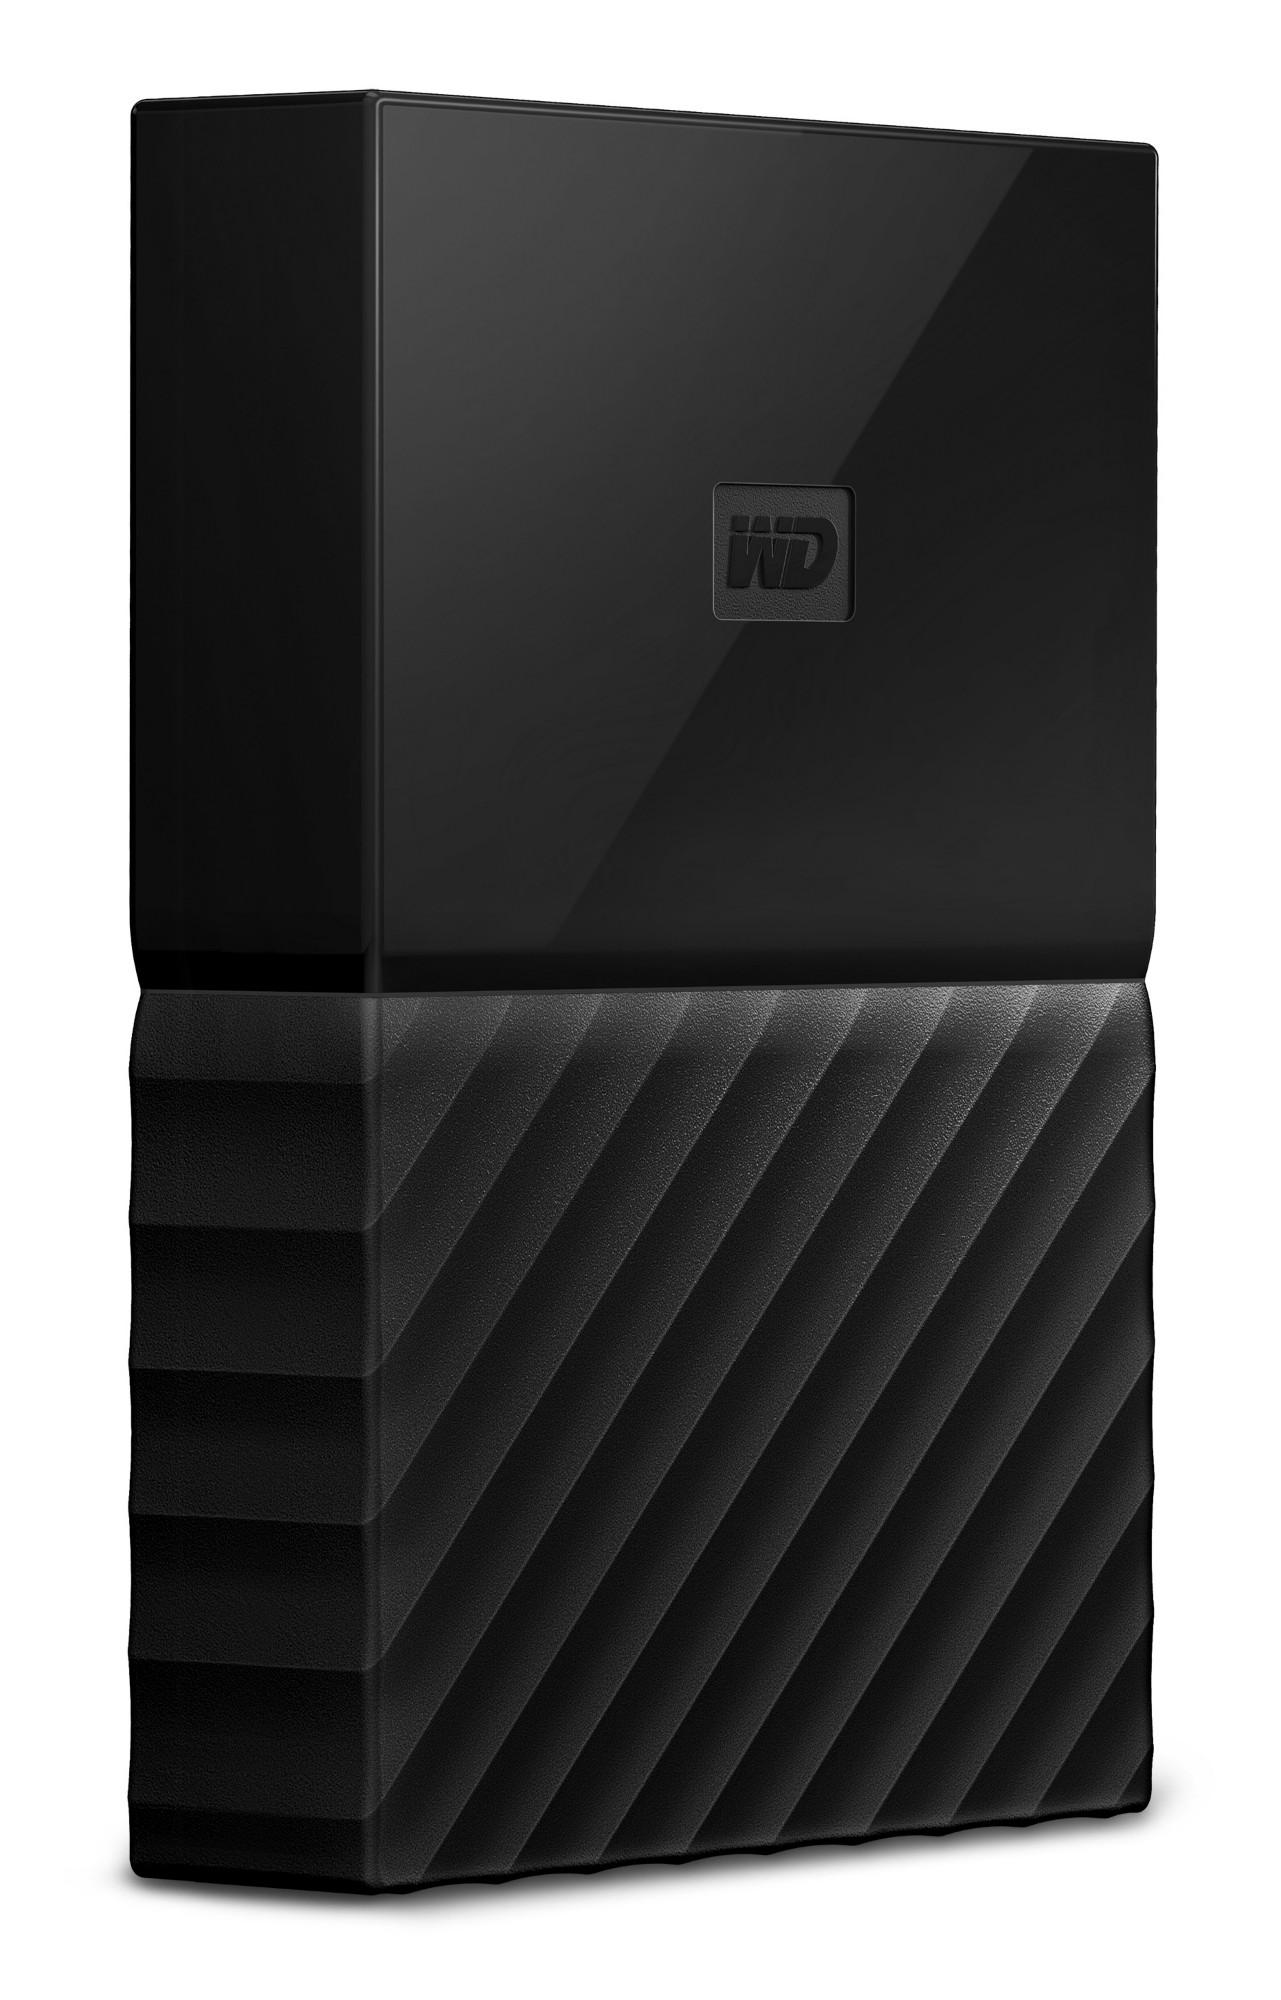 Western Digital My Passport 4000GB Black external hard drive